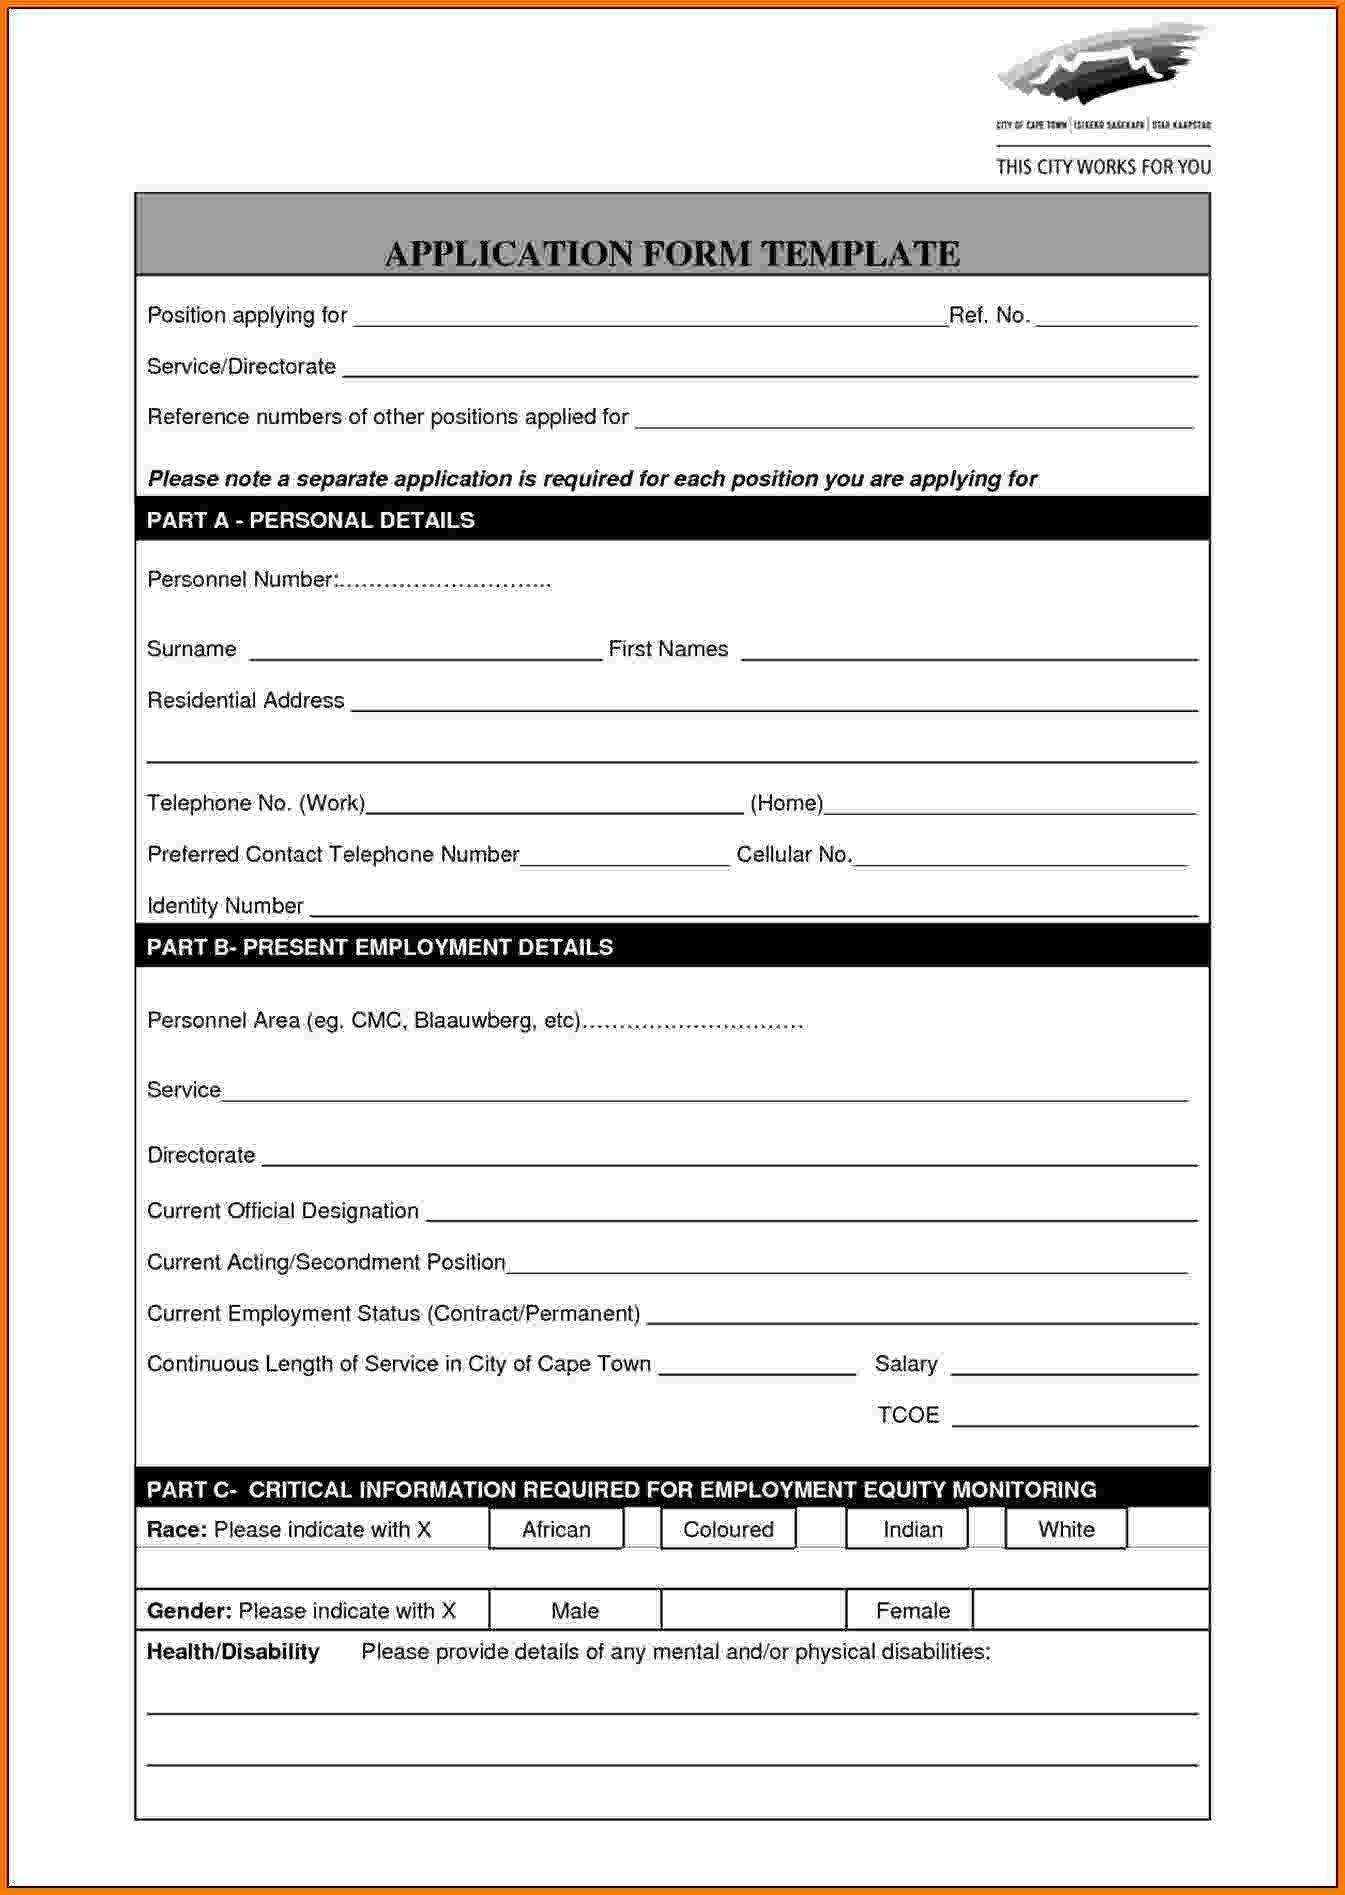 Standard Job Application Template 8 Application form Template